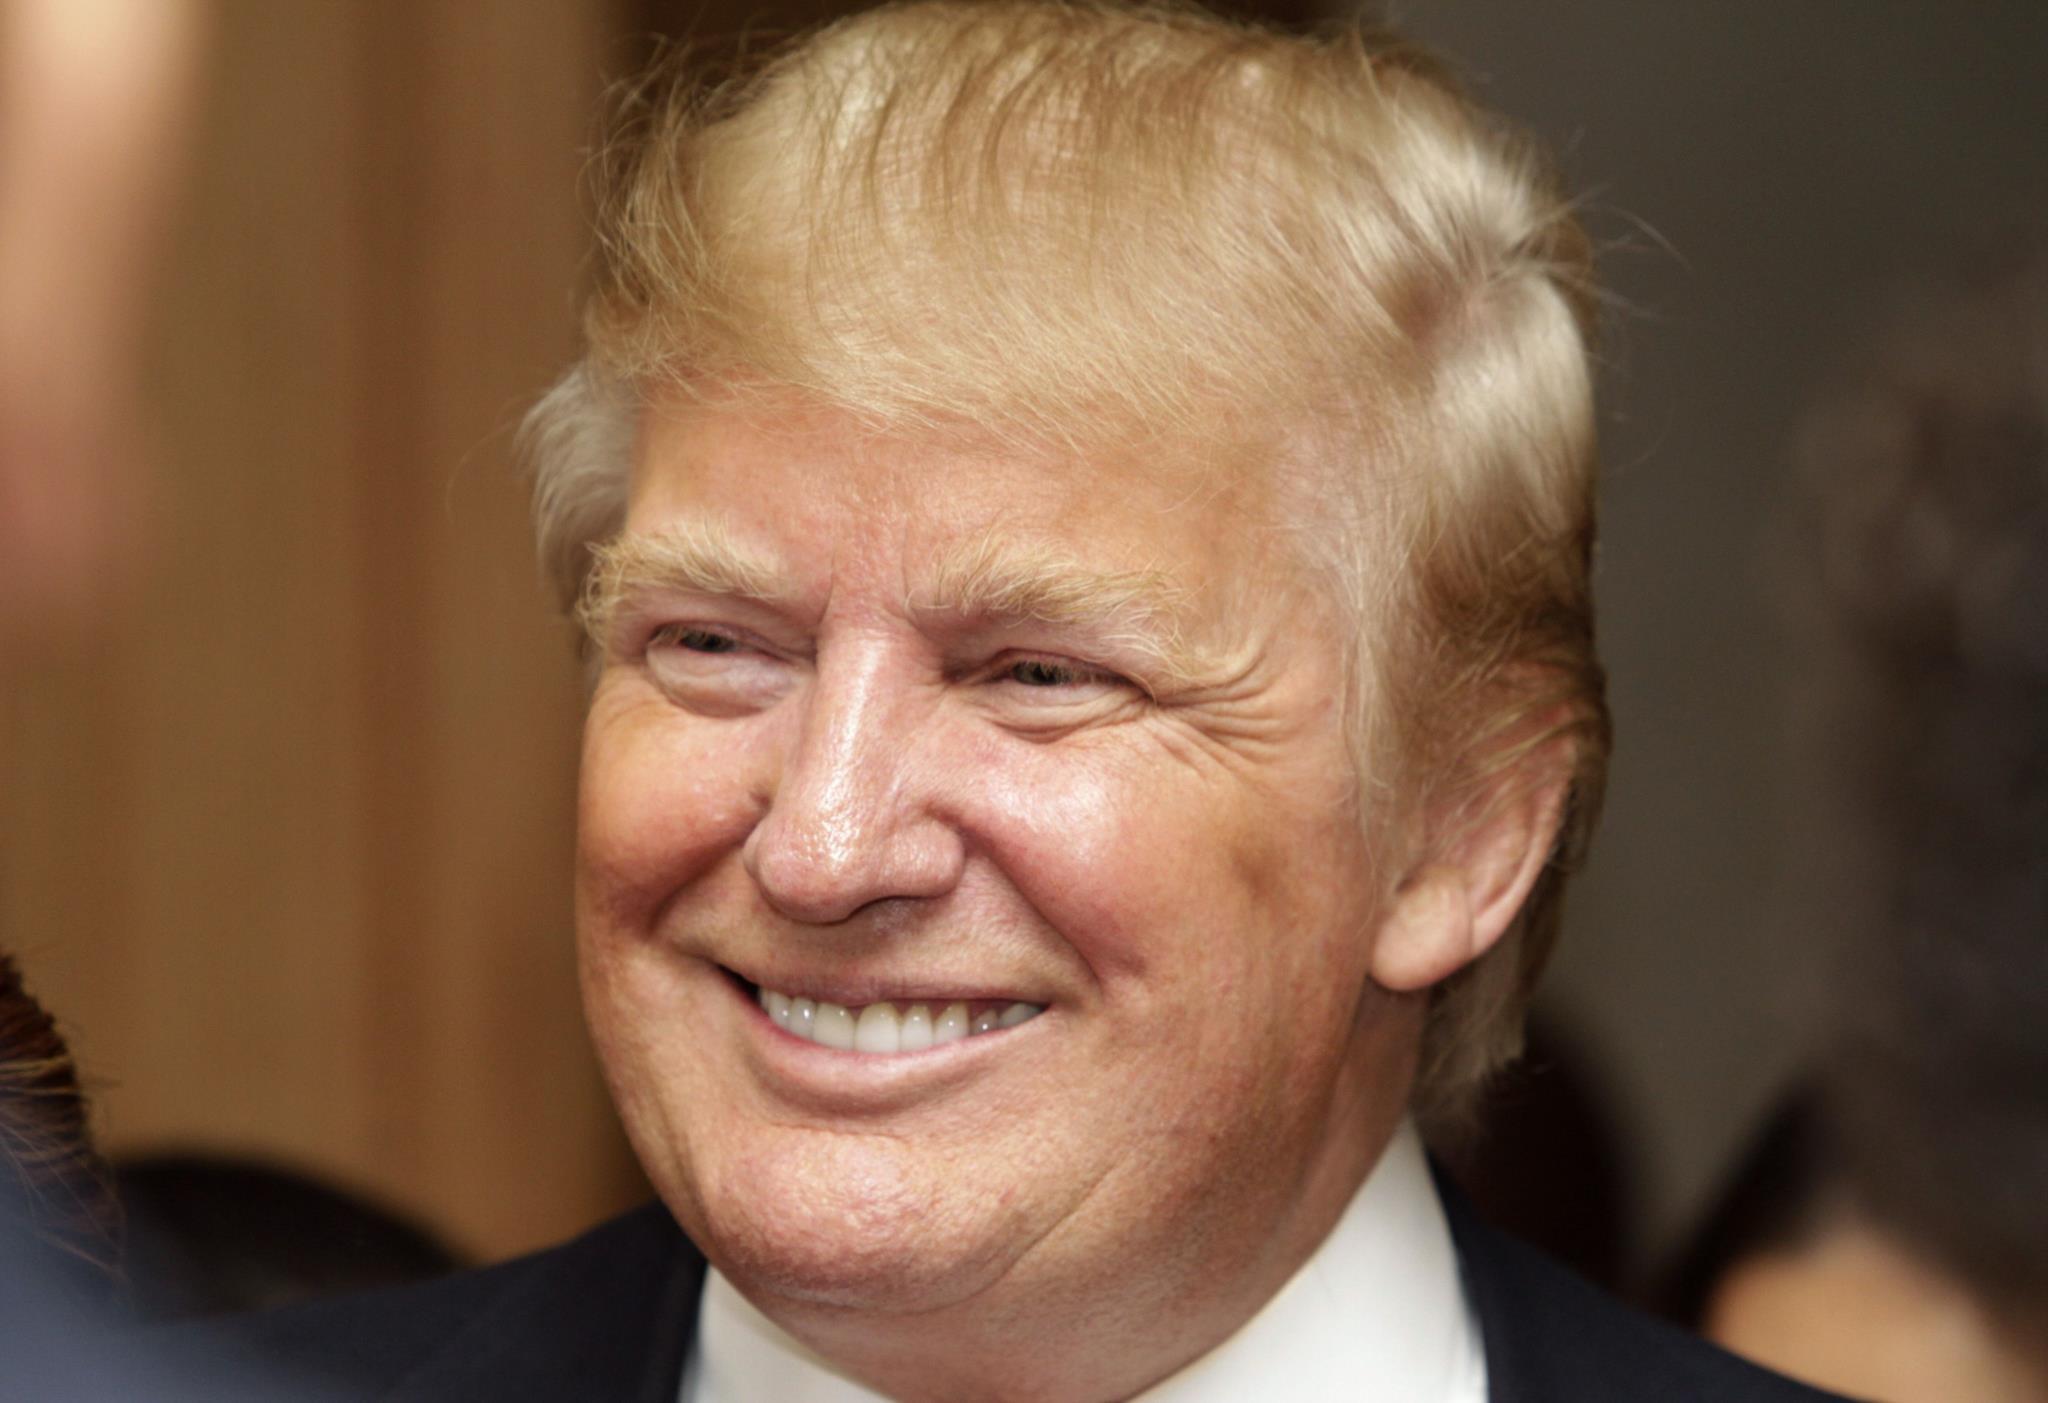 Donald Trump toma posse nesta sexta-feira